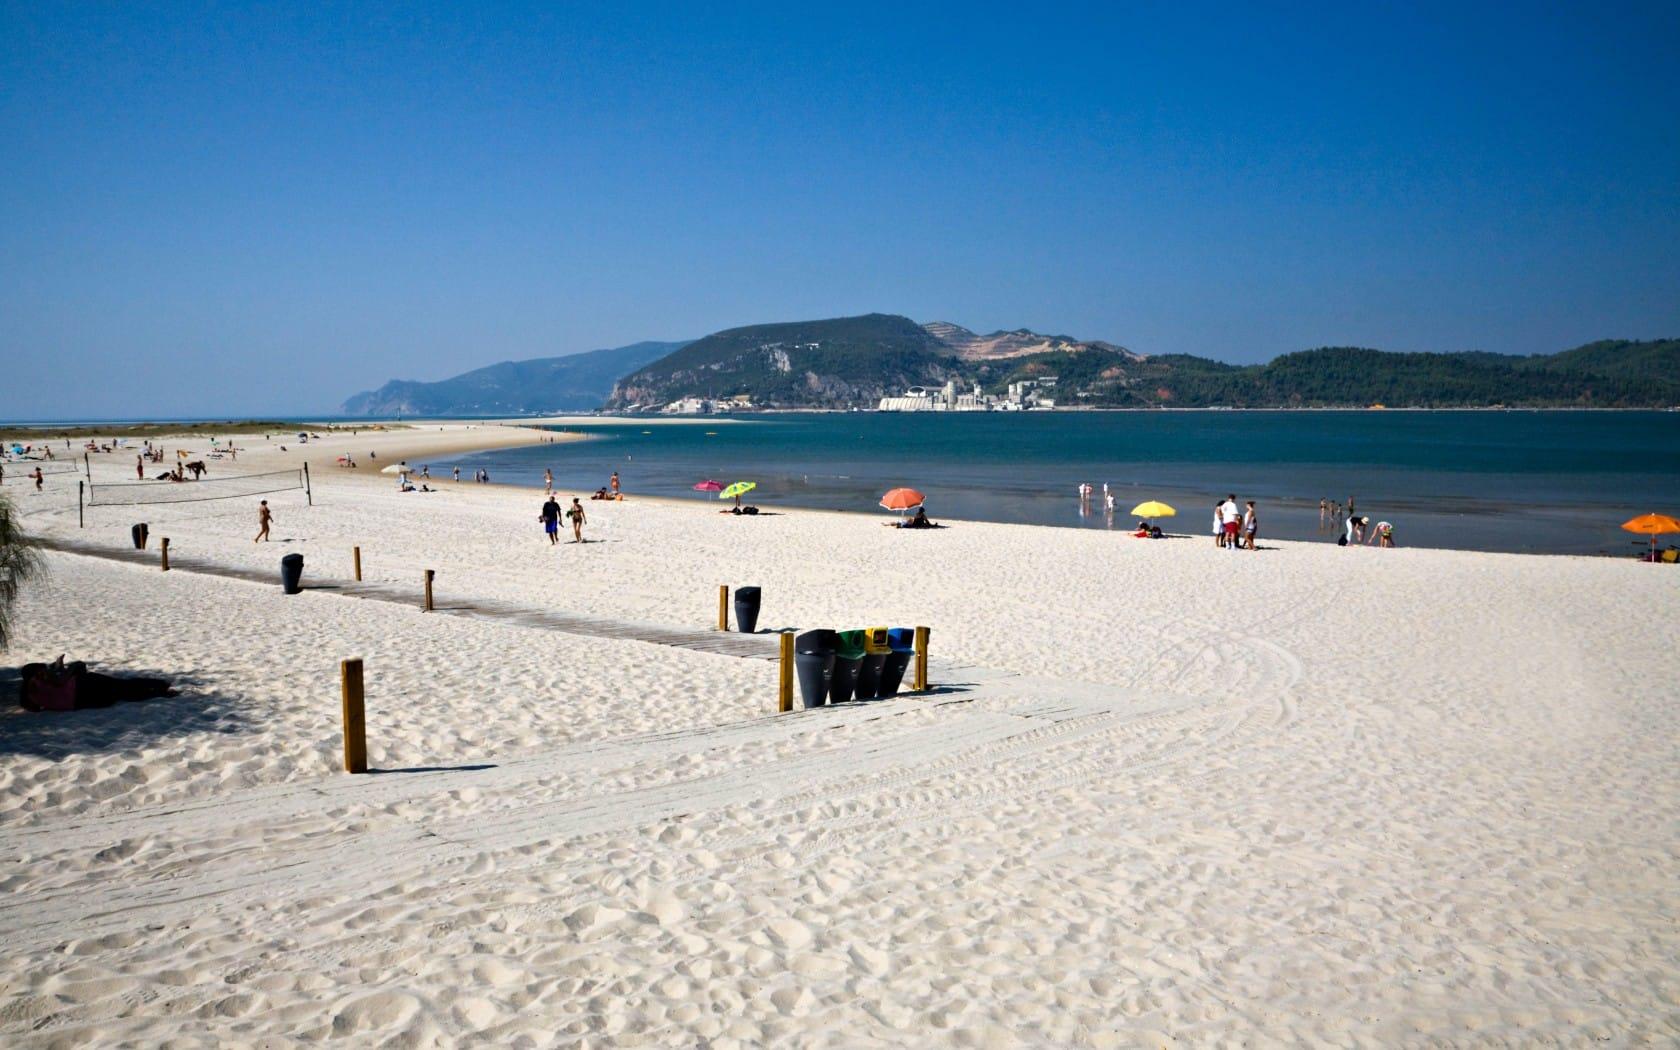 White sand beach at Troia Peninsula, Portugal